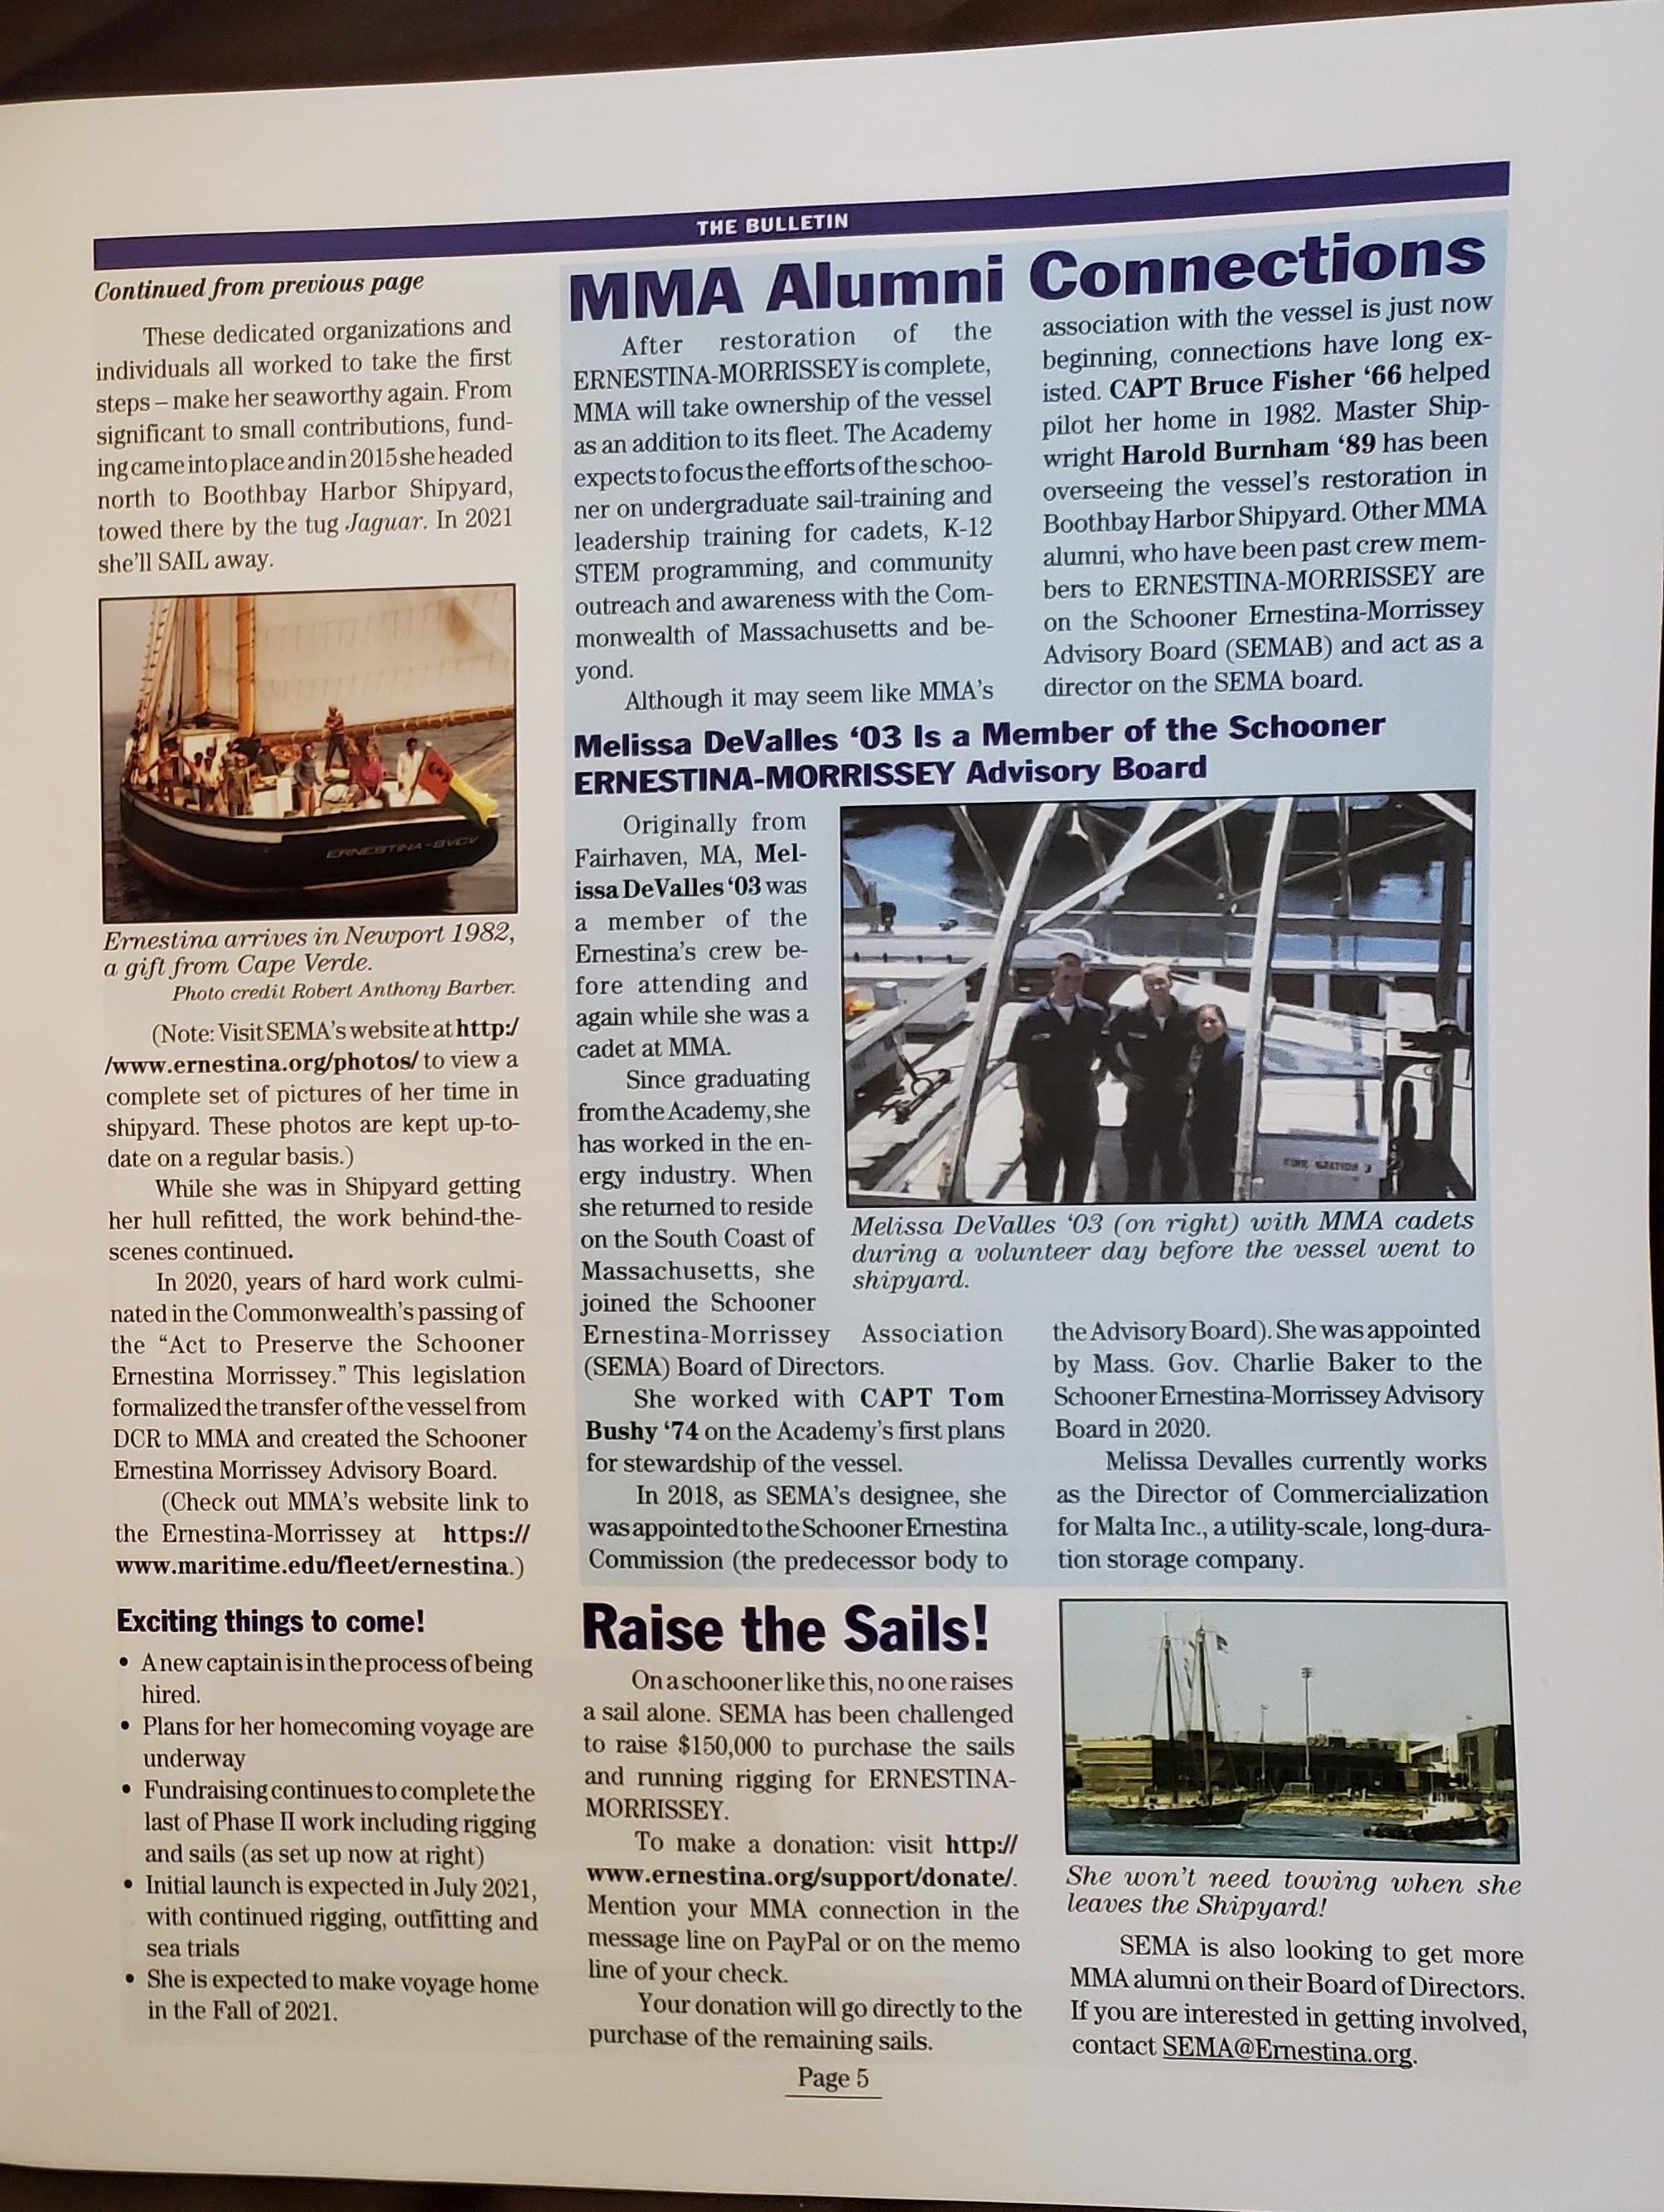 20210315_MMMA-M Bulletin page 5